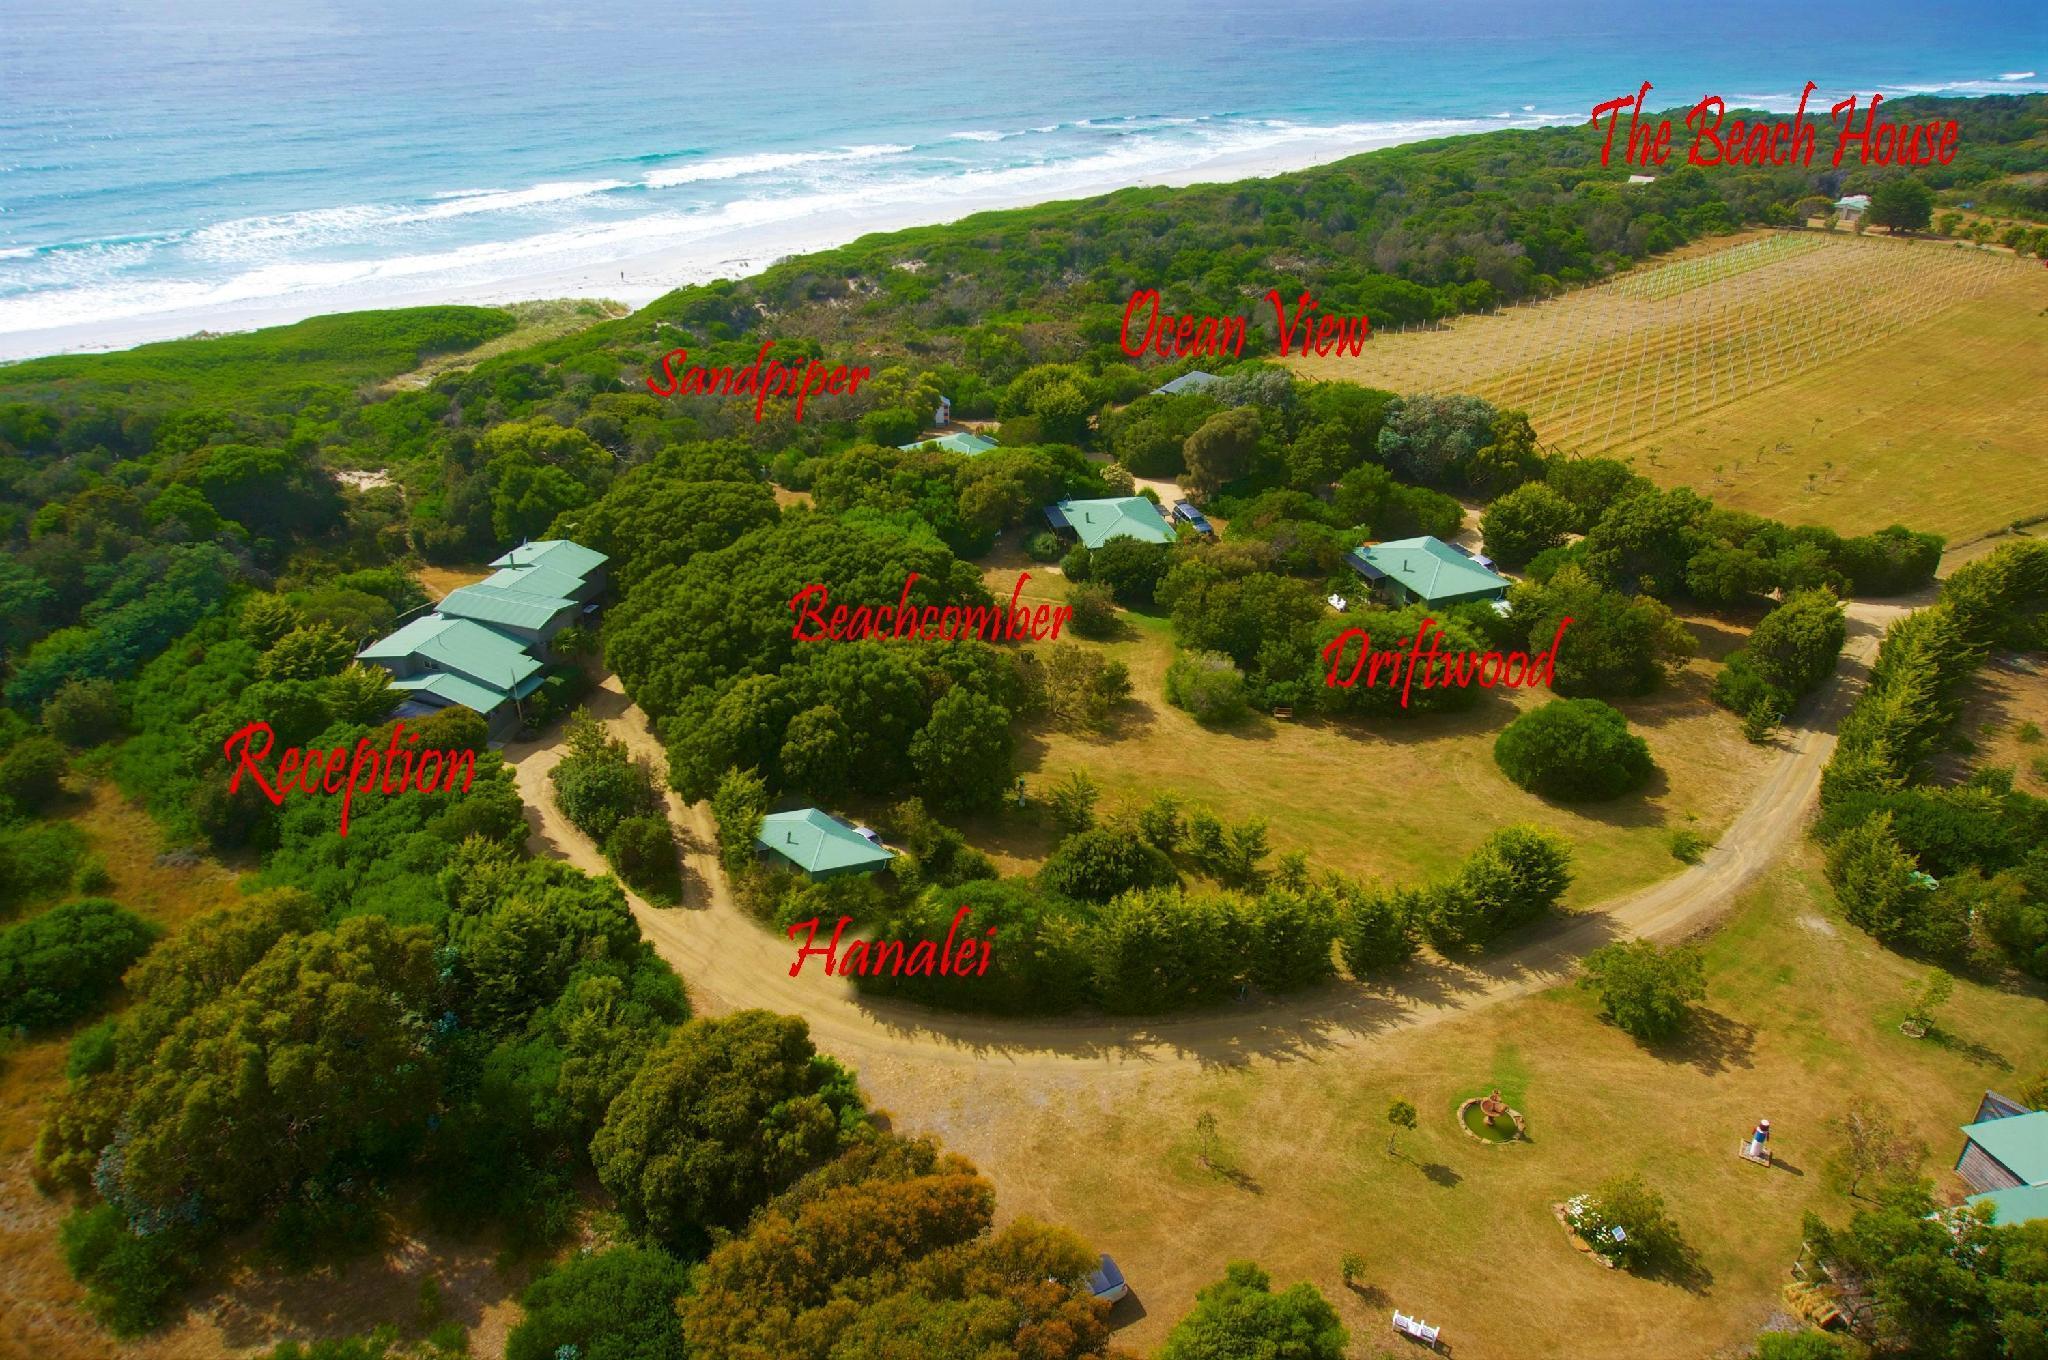 Sandpiper Ocean Cottages